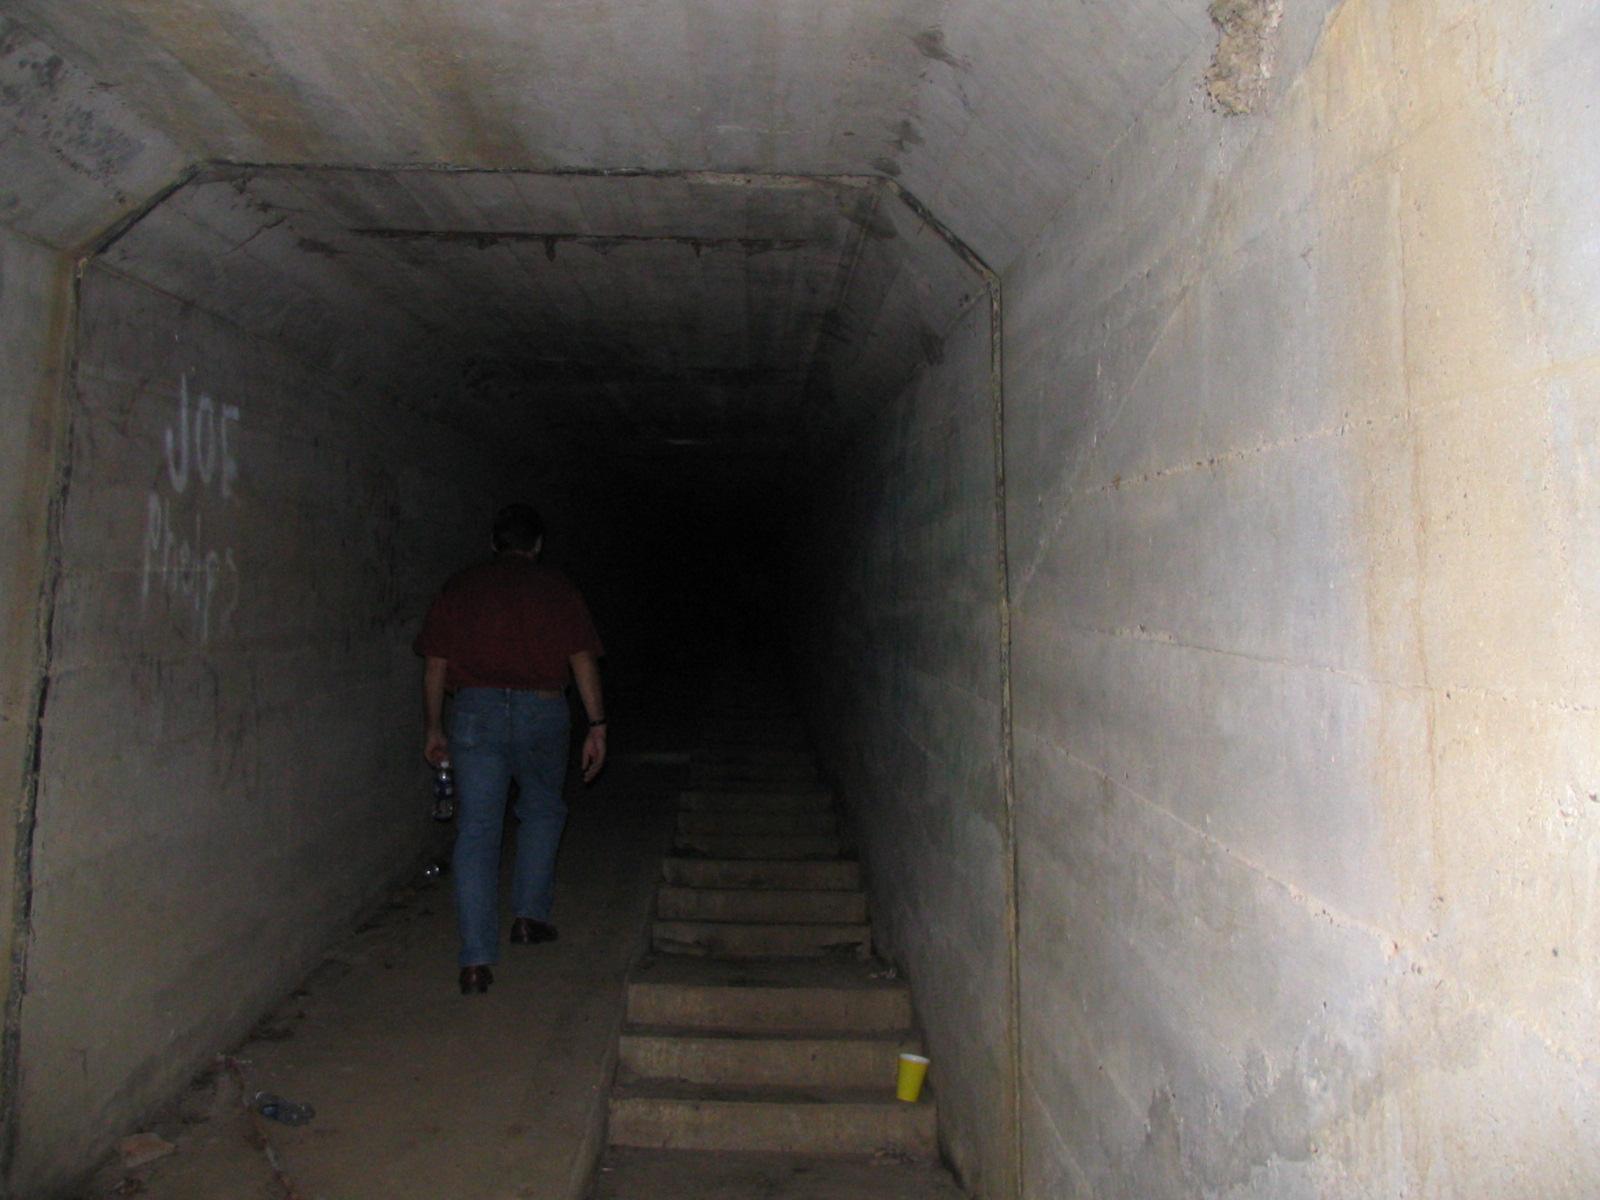 Kentucky S Waverly Hills Sanatorium Starred In A Movie